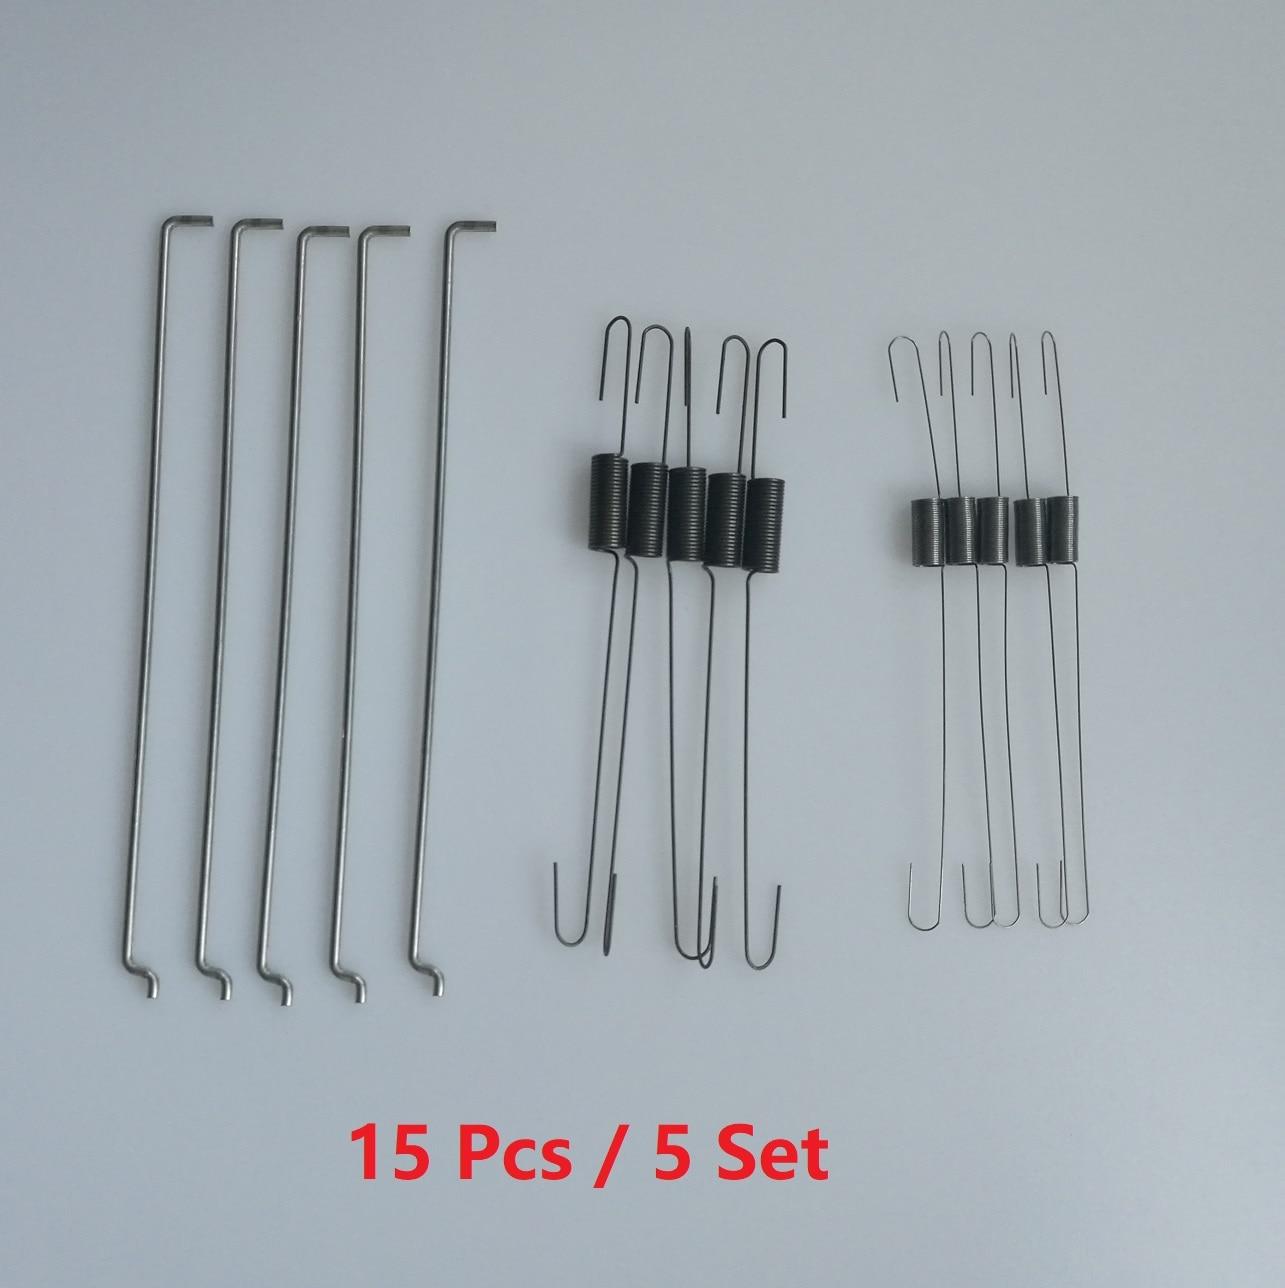 15pcs/5set 6pcs Metal Throttle Return Spring Governor Link Rod Set 16555-ZE1-000 16561-ZE1-020 Fit For Honda GX140 GX160 GX200